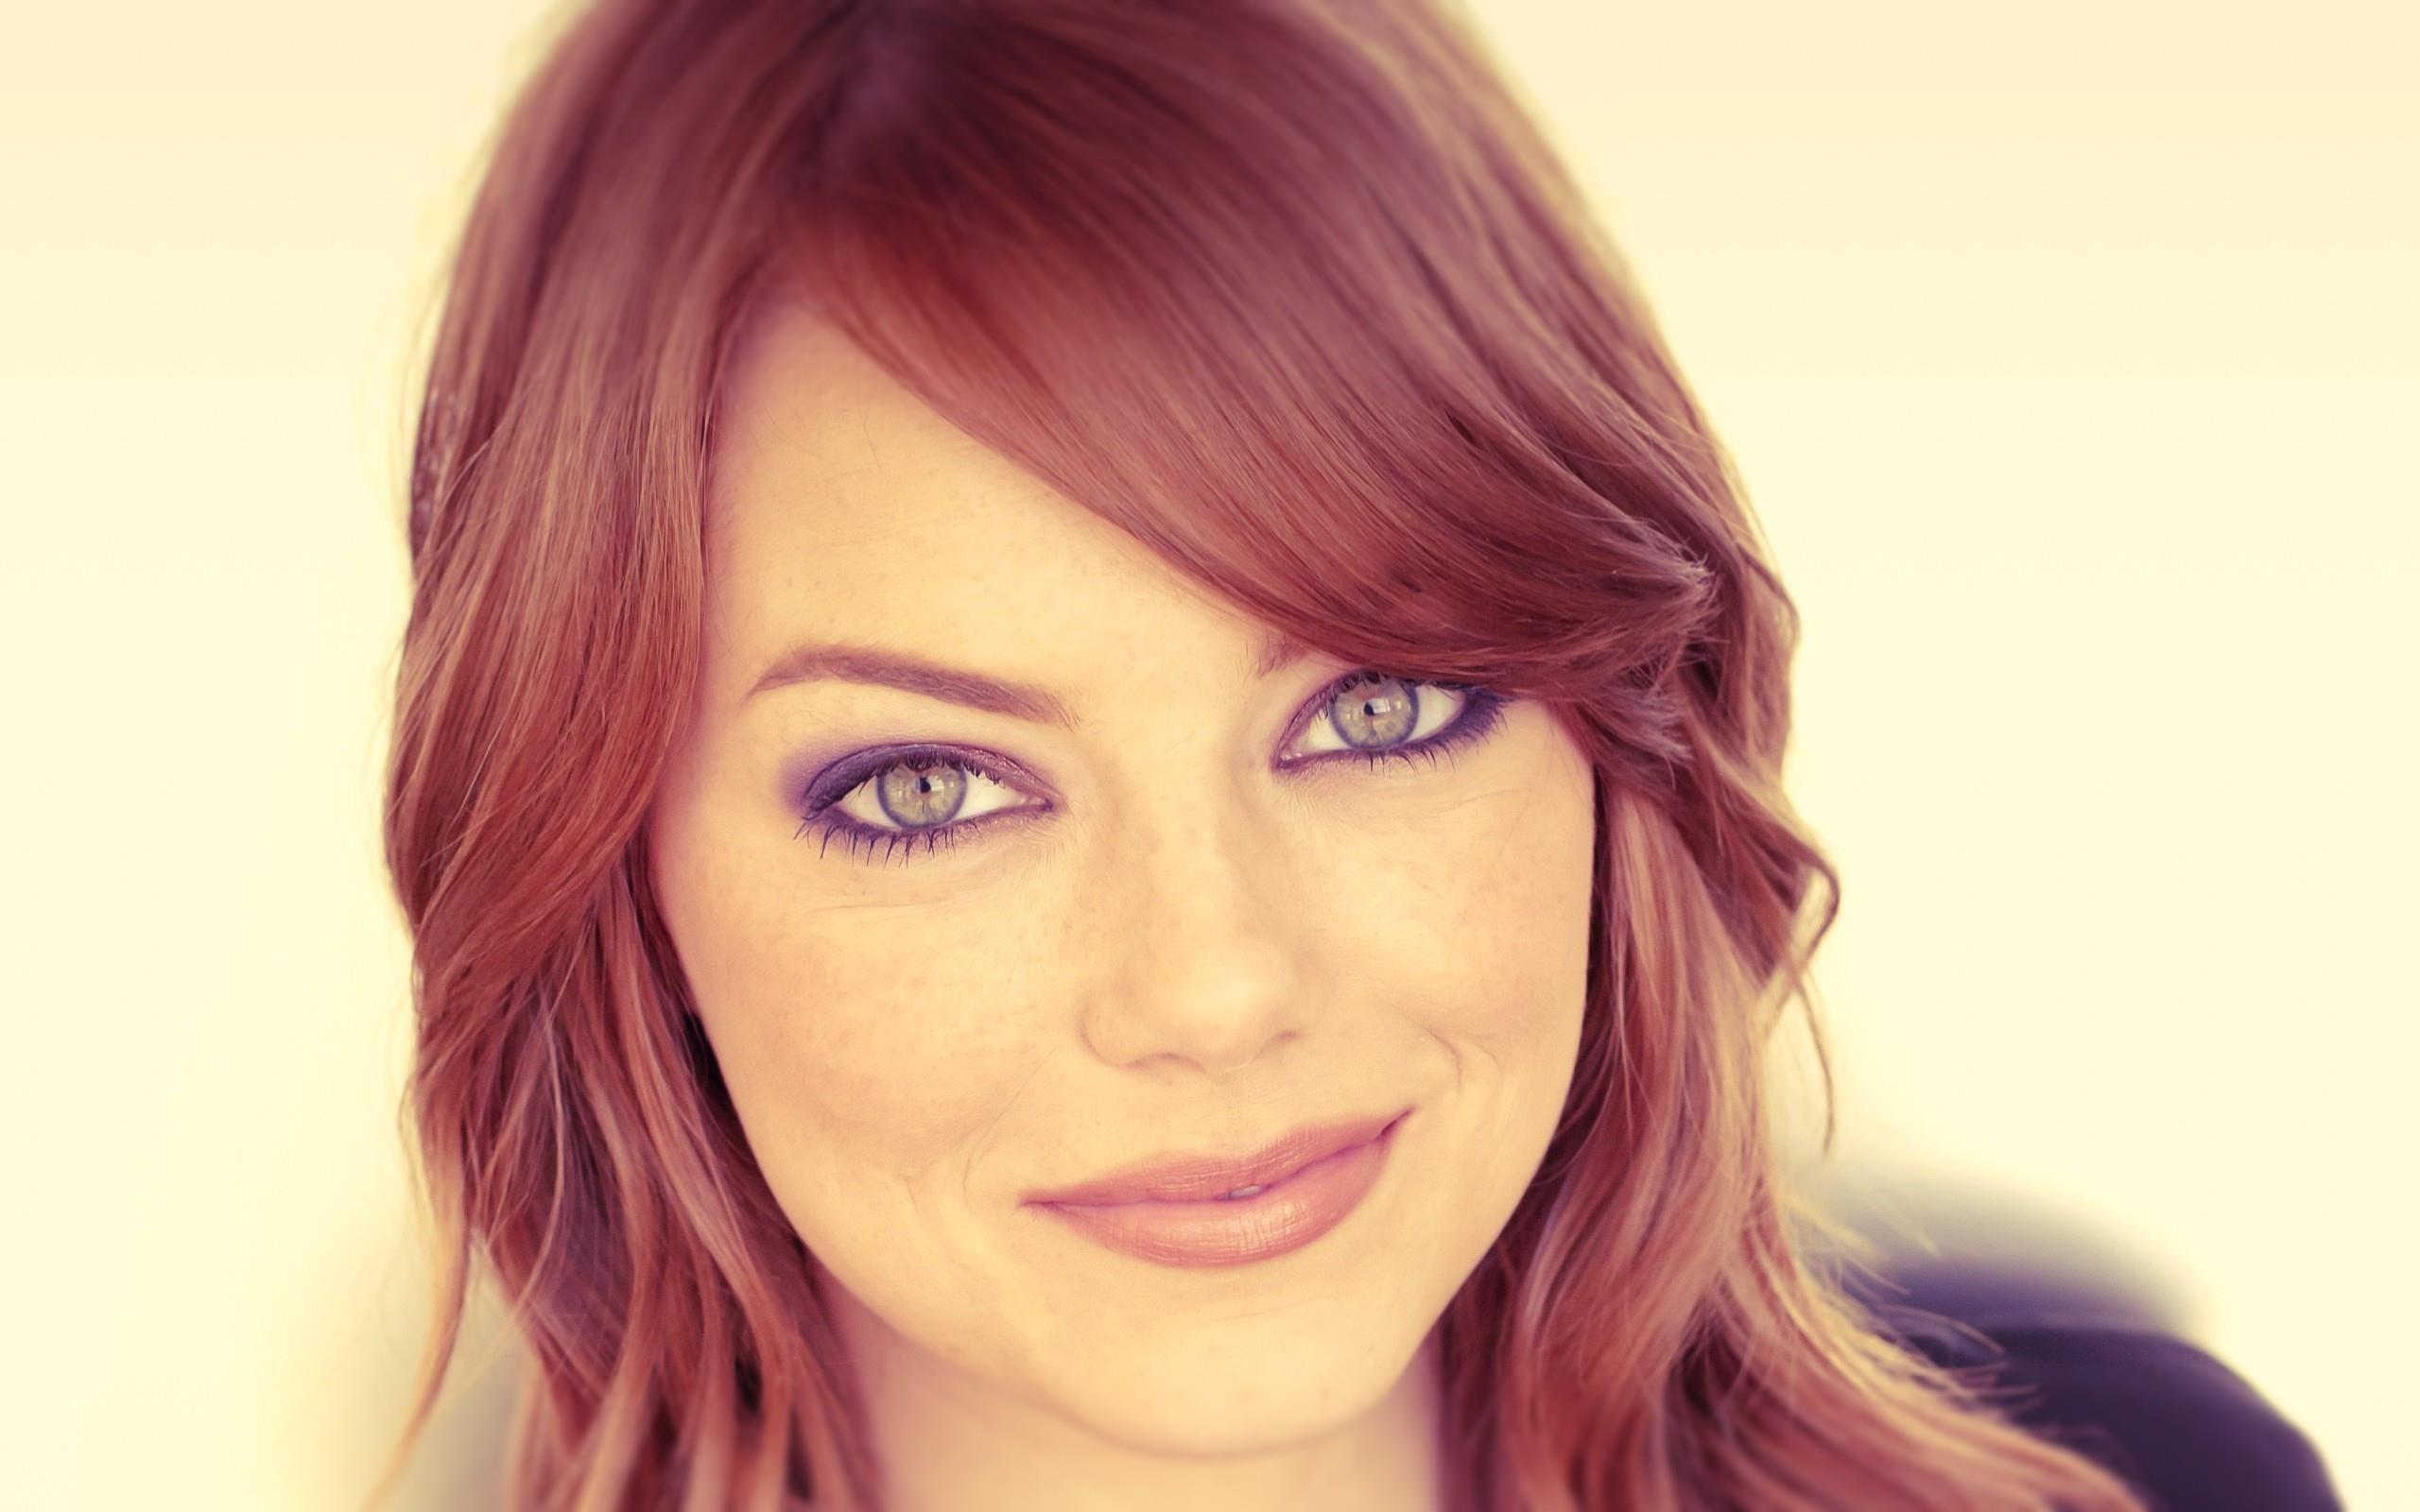 Lovely Actress Emma Stone Photo HD Wallpaper